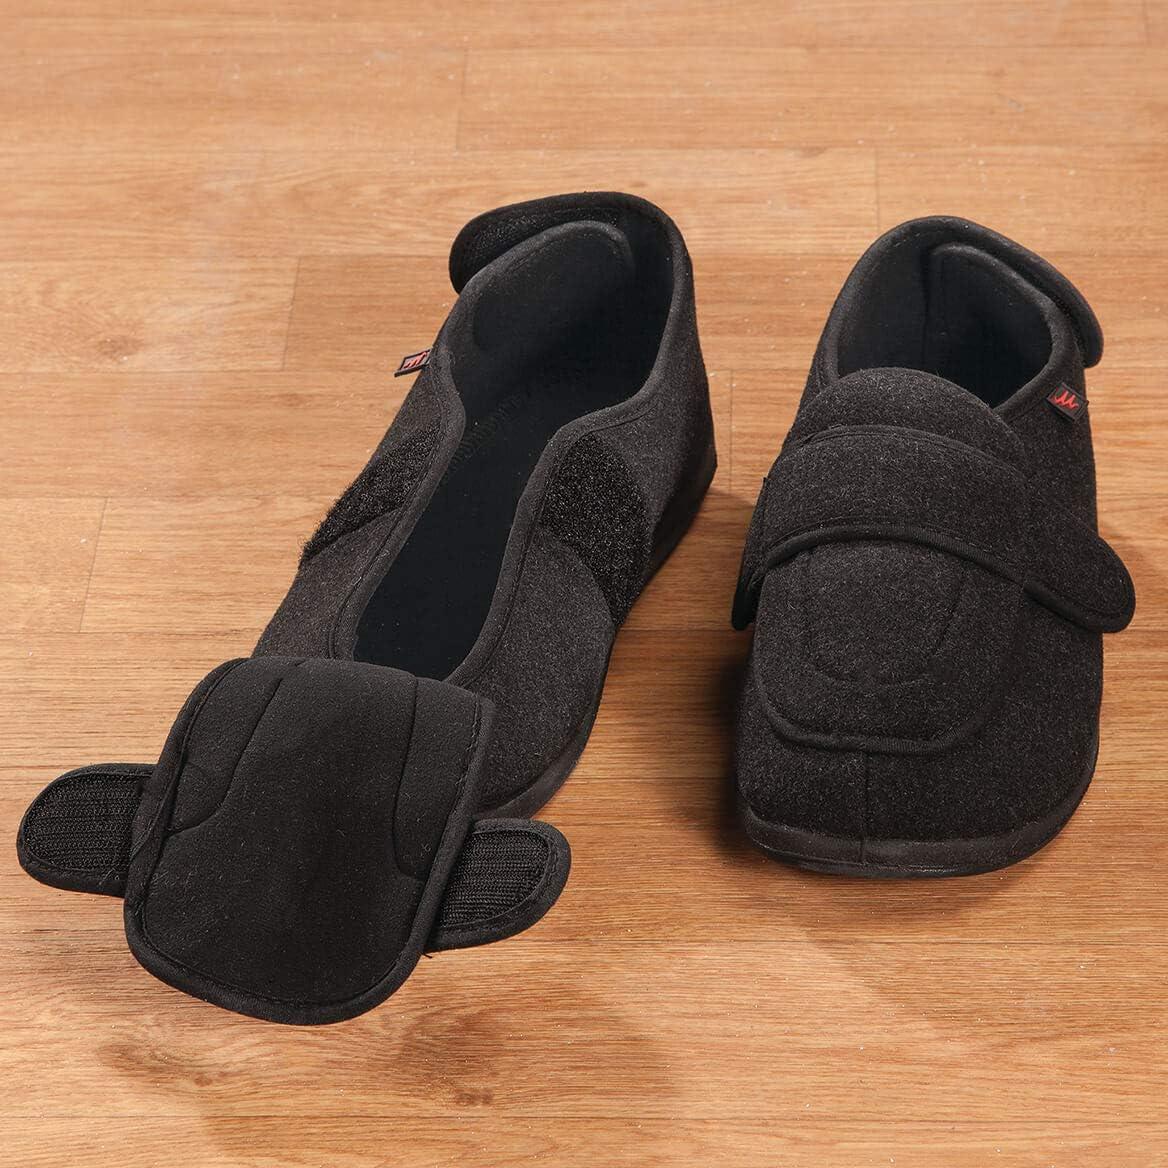 Fox Valley Traders Adjustable Edema Slippers